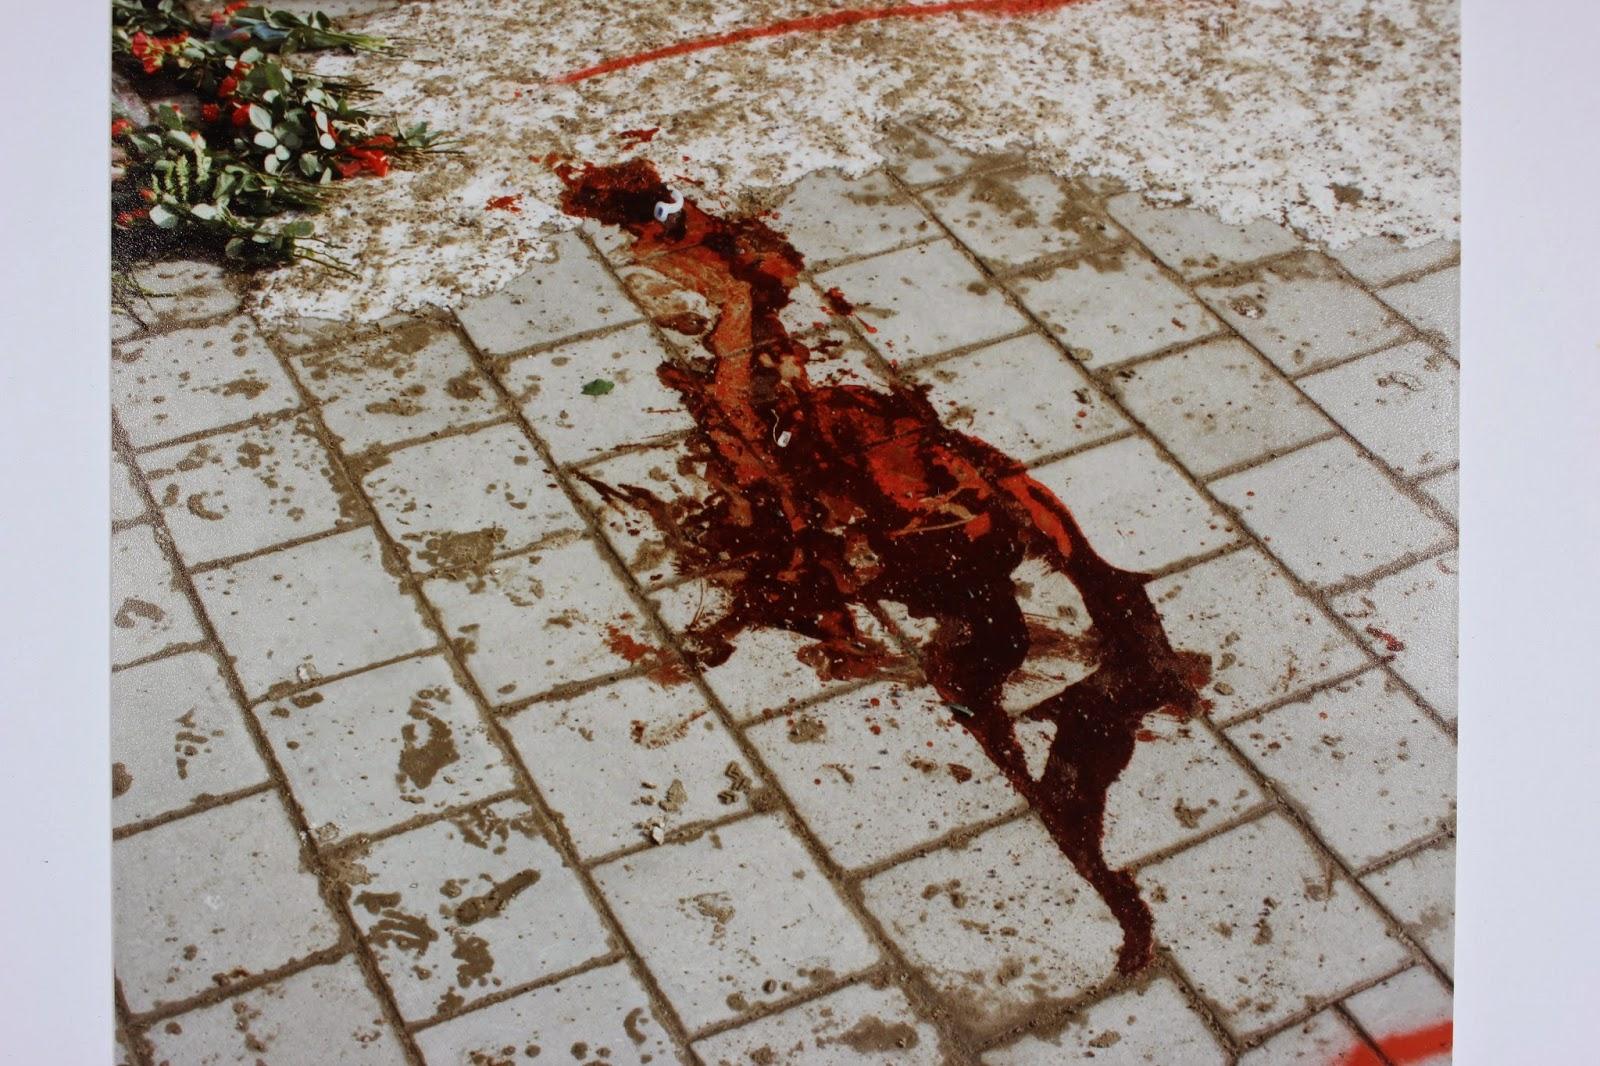 Blodpölen Palmemordet 1